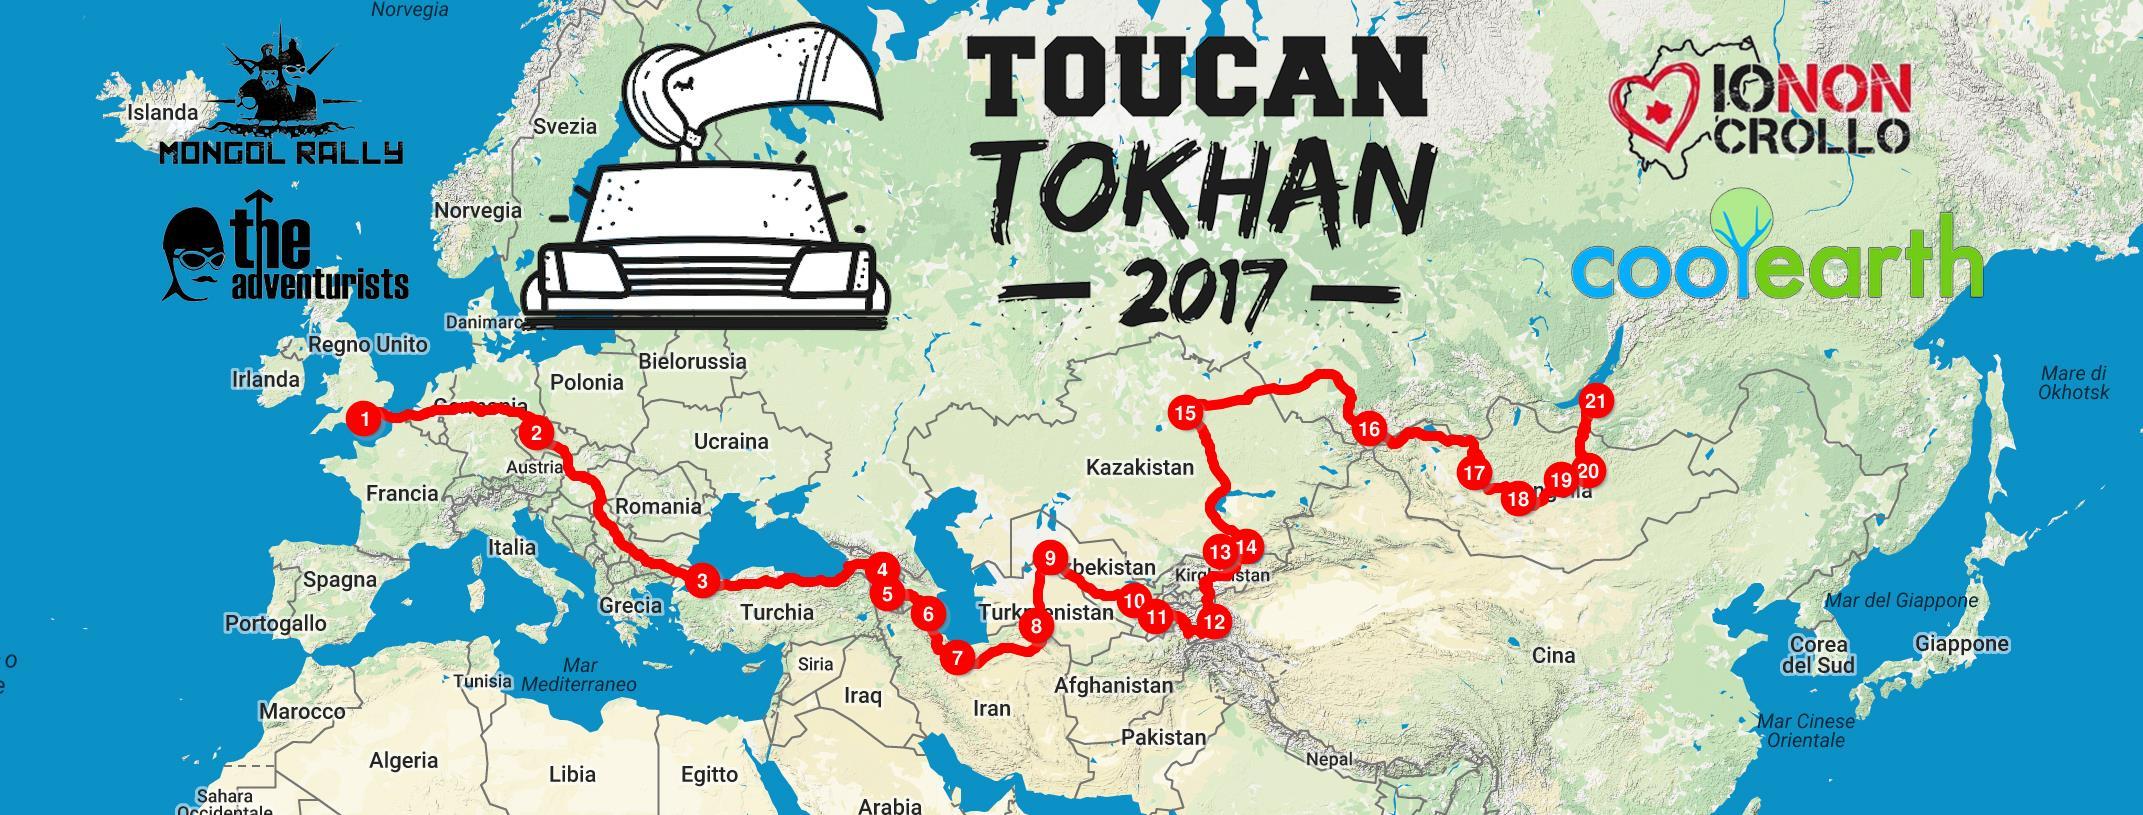 itinerario mongol rally